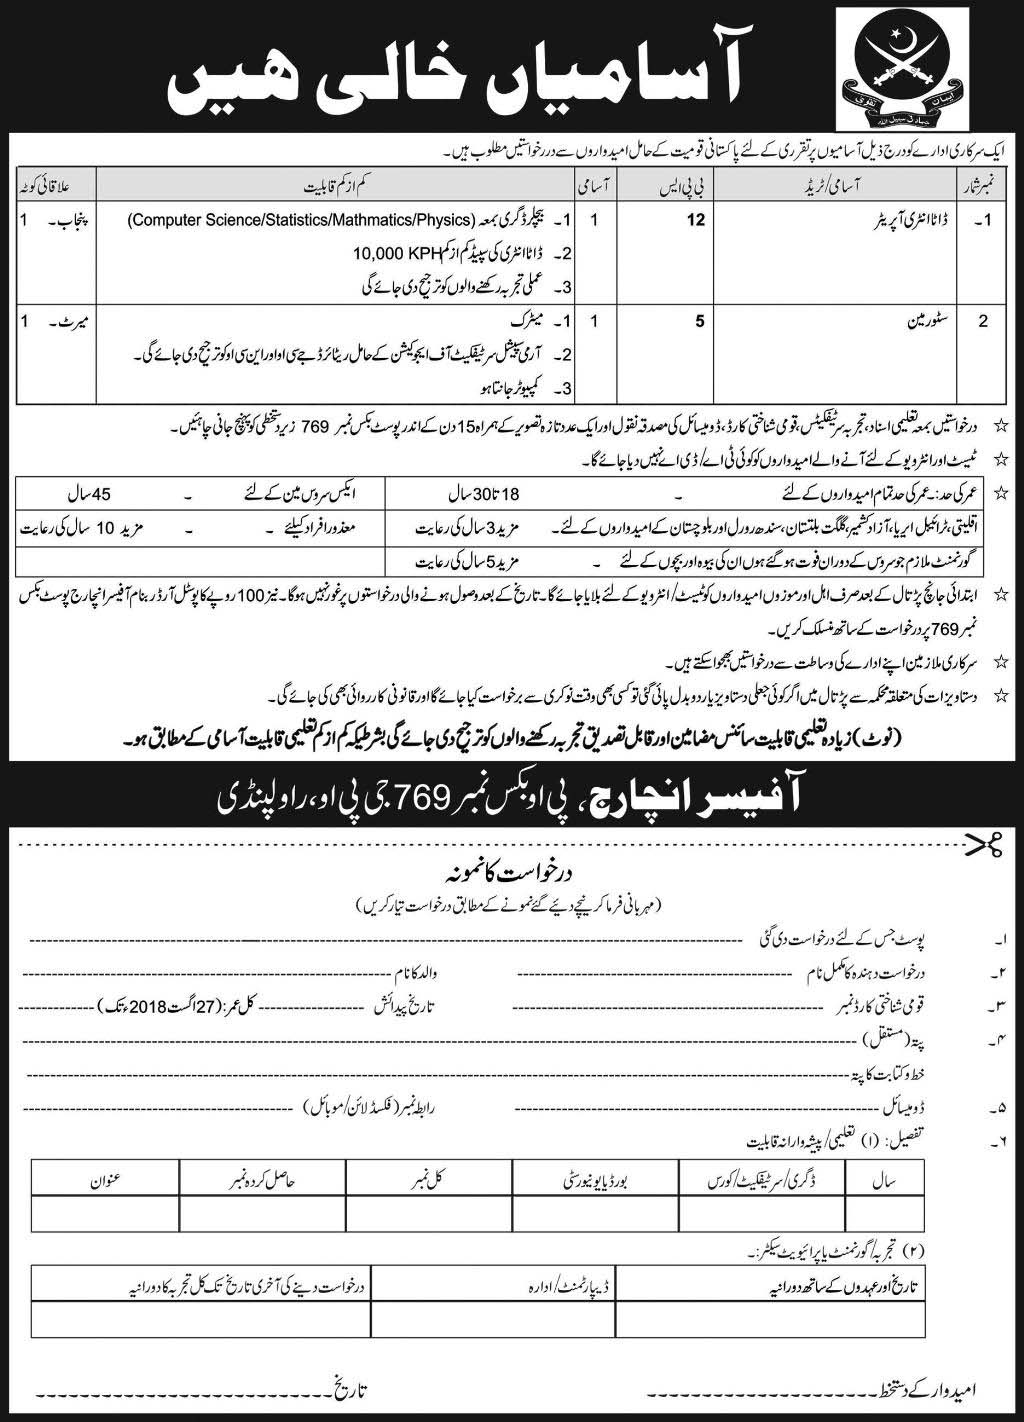 Vaccancies in Govt Organization Rawalpindi